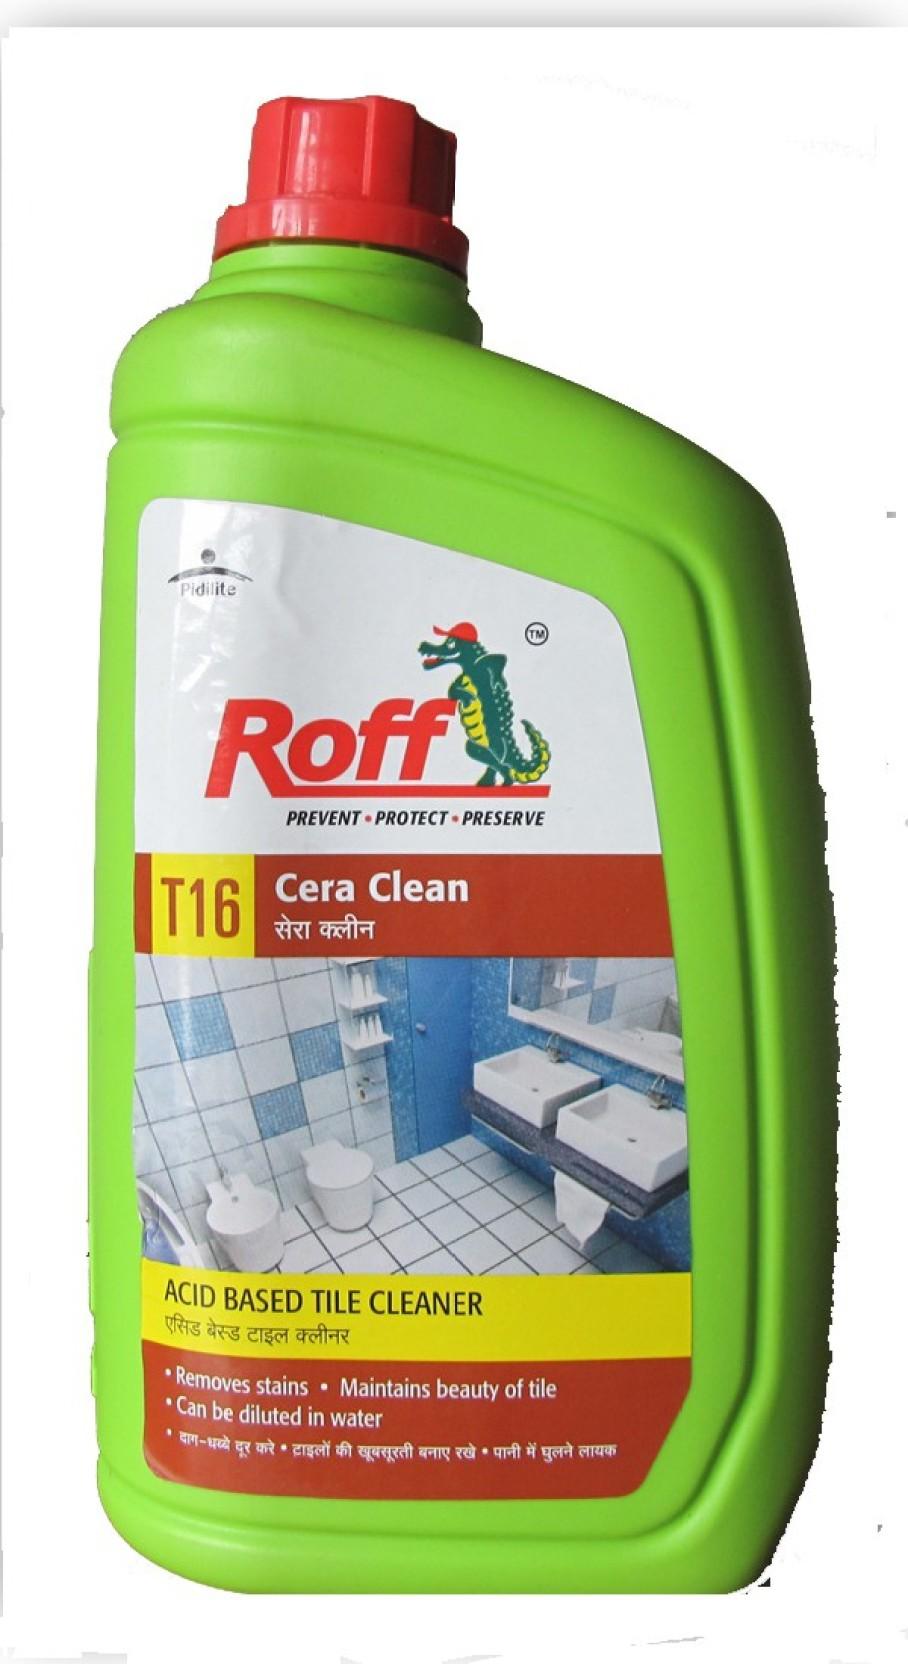 roff cera clean regular floor cleaner price in india buy roff cera clean regular floor cleaner